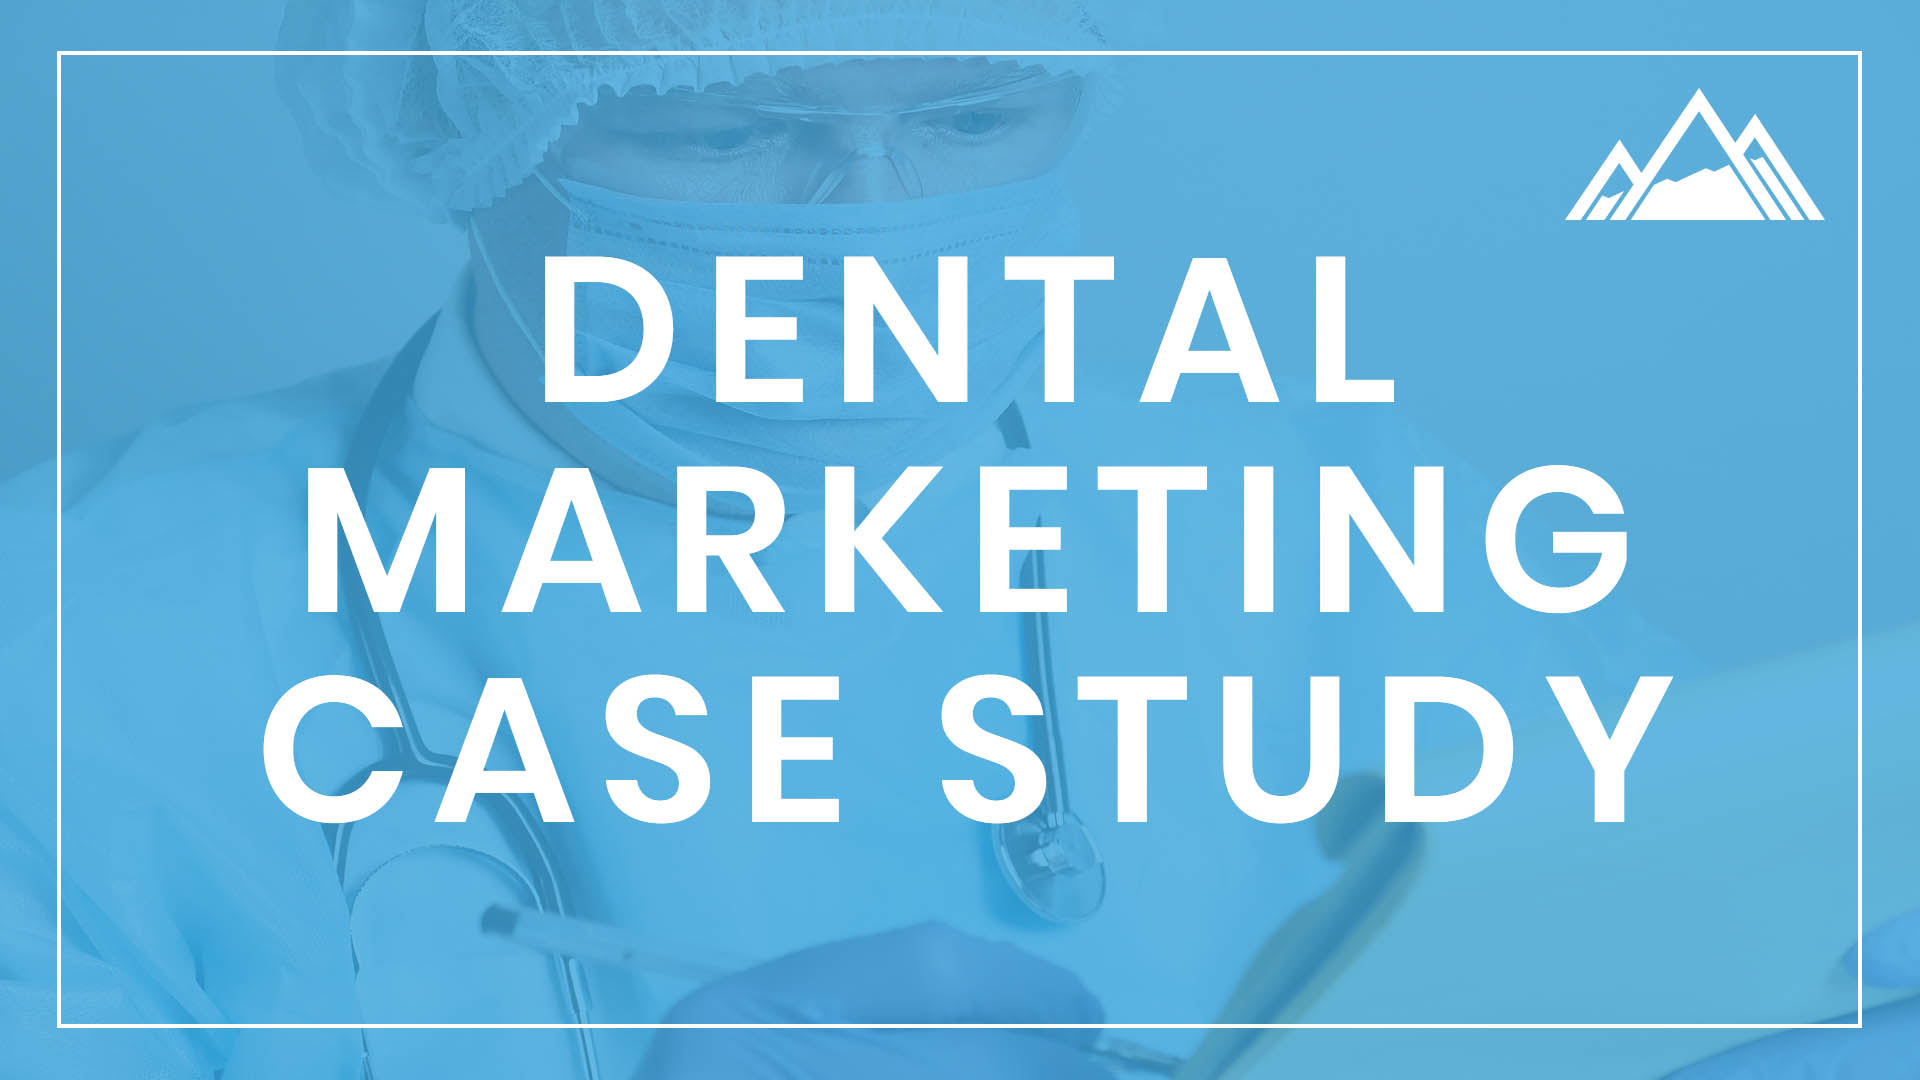 Dental Practice Marketing – Case Study